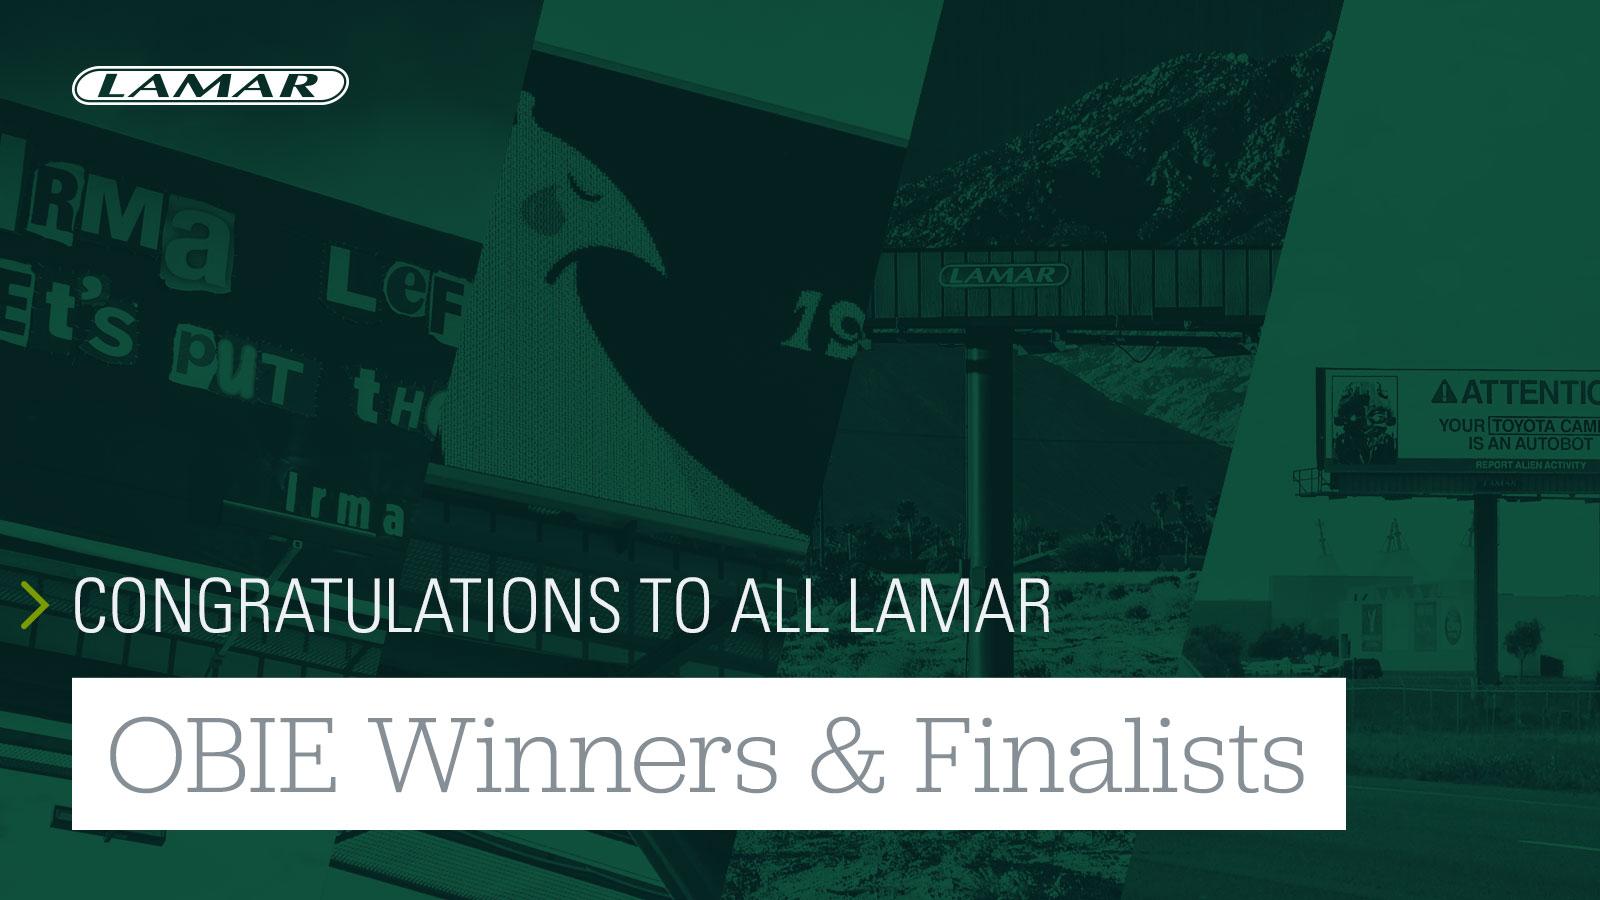 Lamar Obie Winners